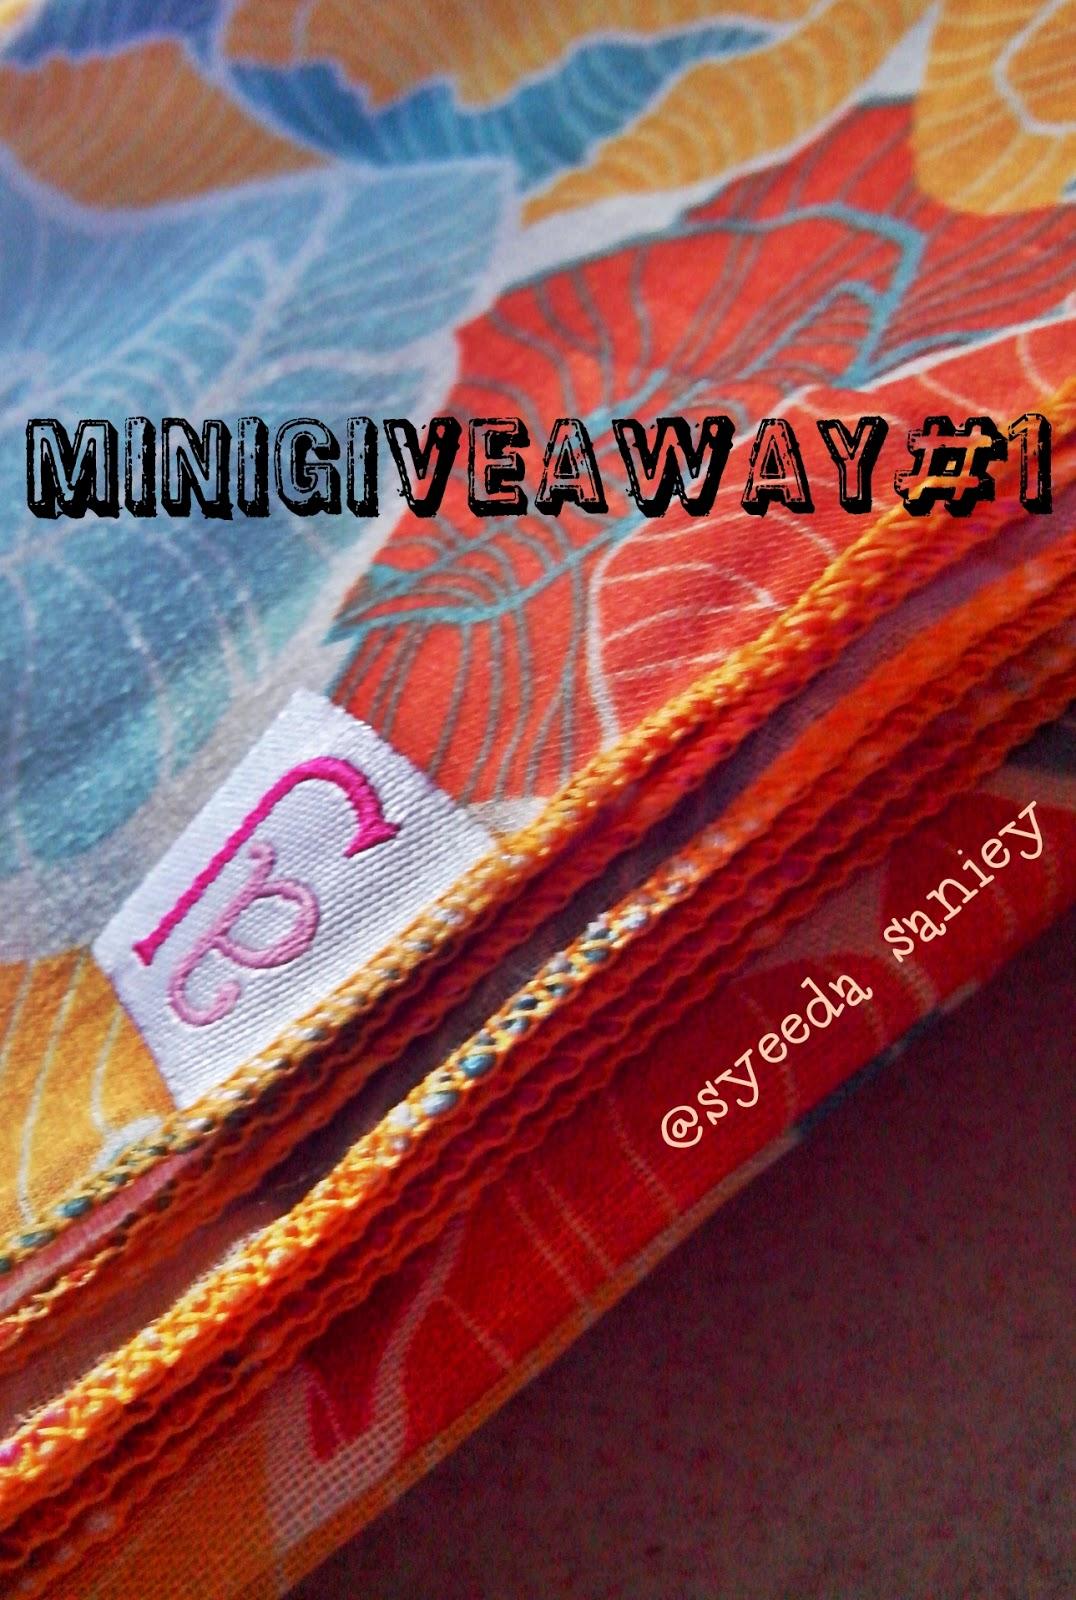 http://syeedasaniey.blogspot.com/2014/12/mini-giveaway-1.html